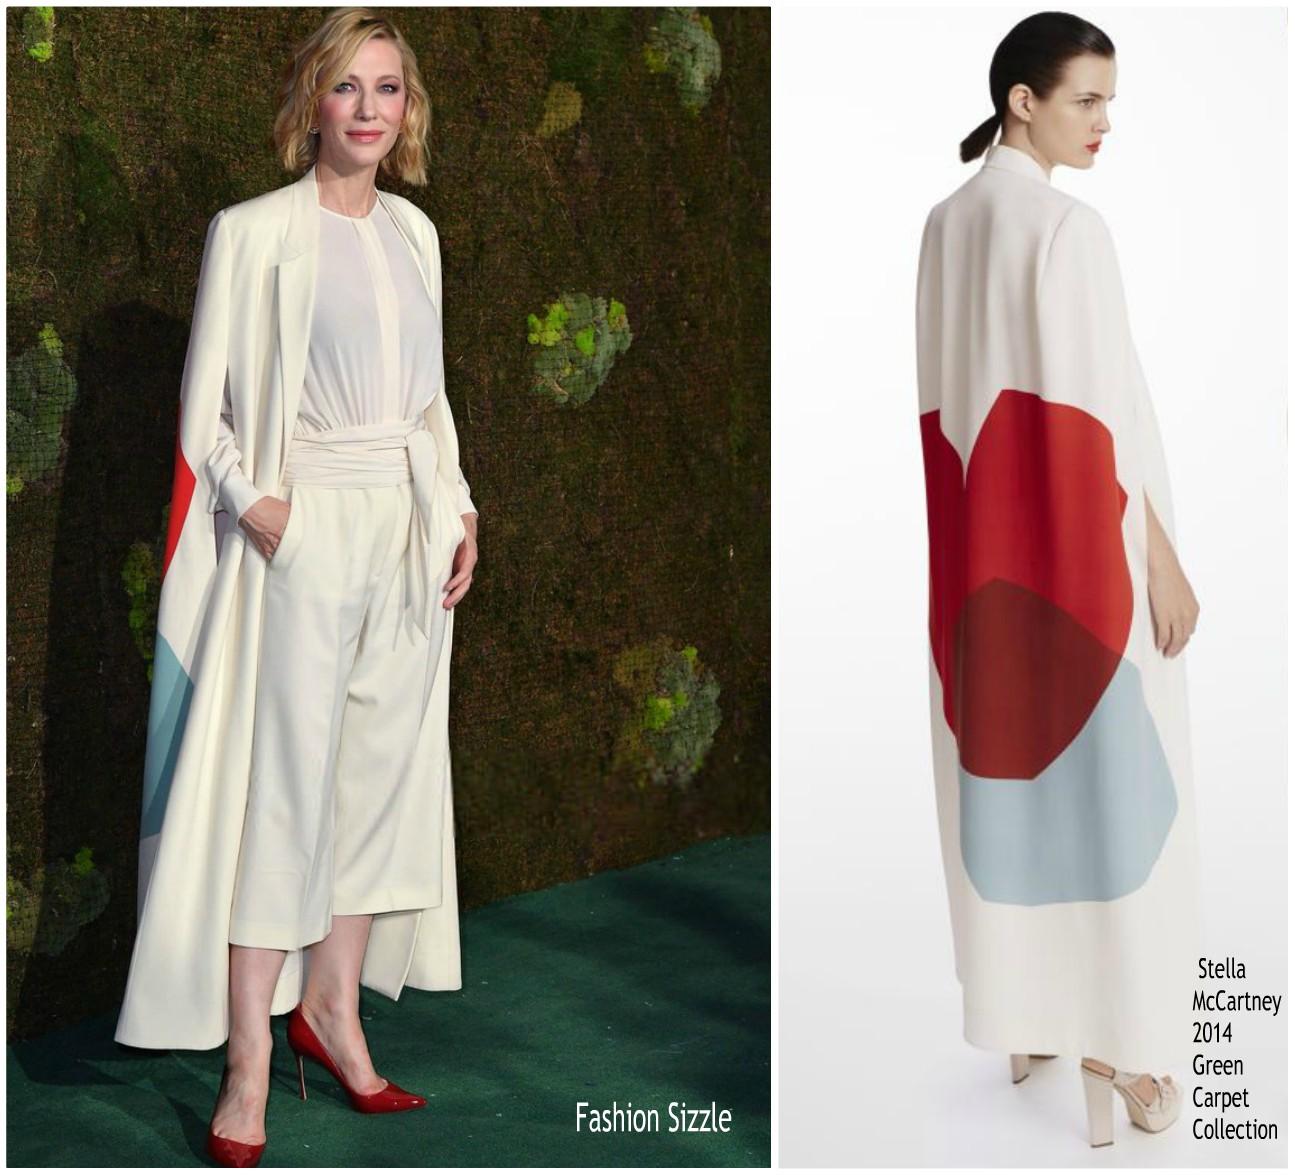 cate-blanchett-in-stella-mccartney-green-carpet-collection-green-carpet-fashion-awards-italia-2018